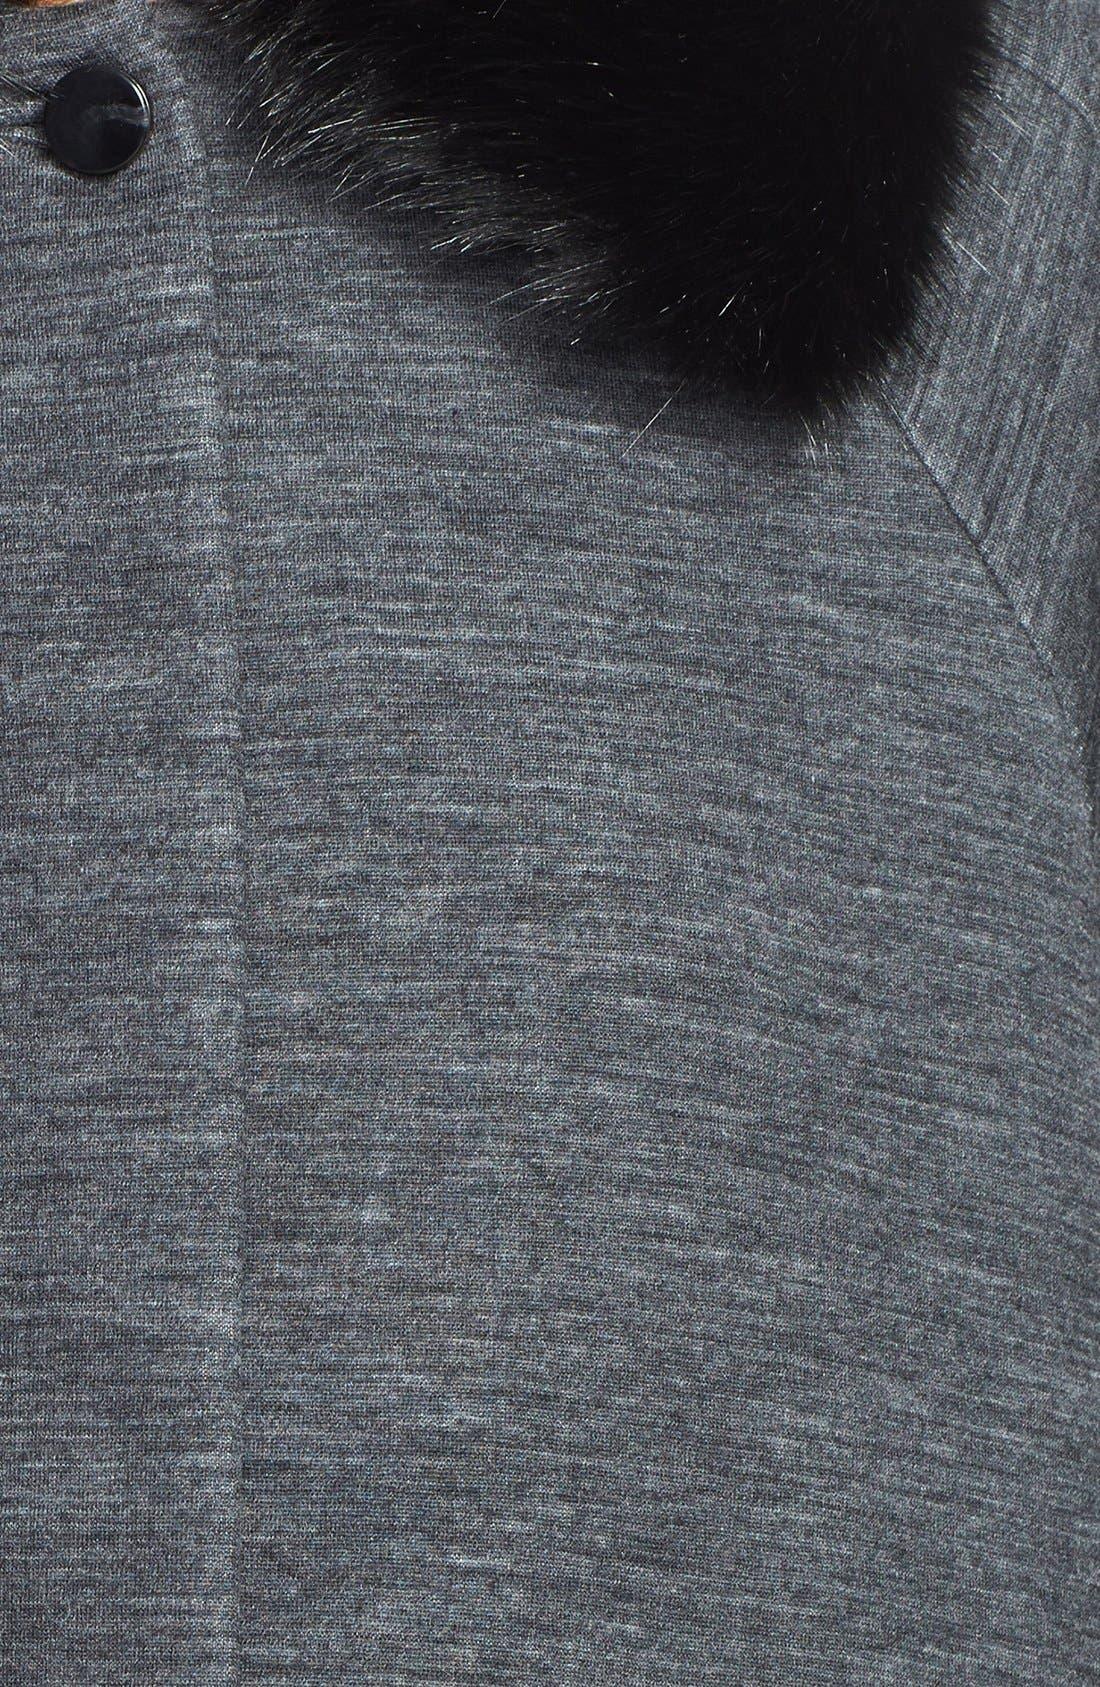 Alternate Image 3  - MARC BY MARC JACOBS 'Gertrude' Faux Fur & Double Face Wool Blend Coat